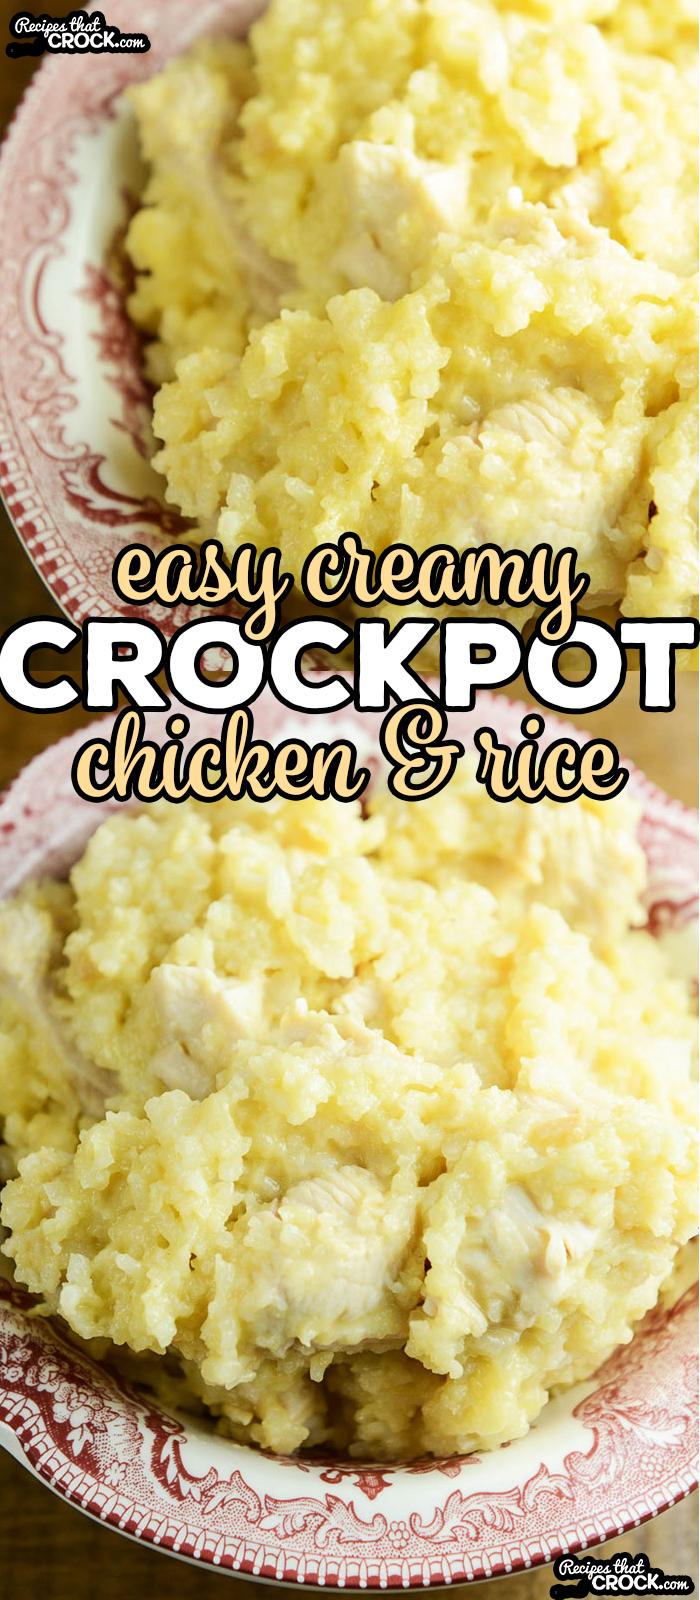 Easy Creamy Chicken Rice Casserole! So simple to throw together. via @recipescrock